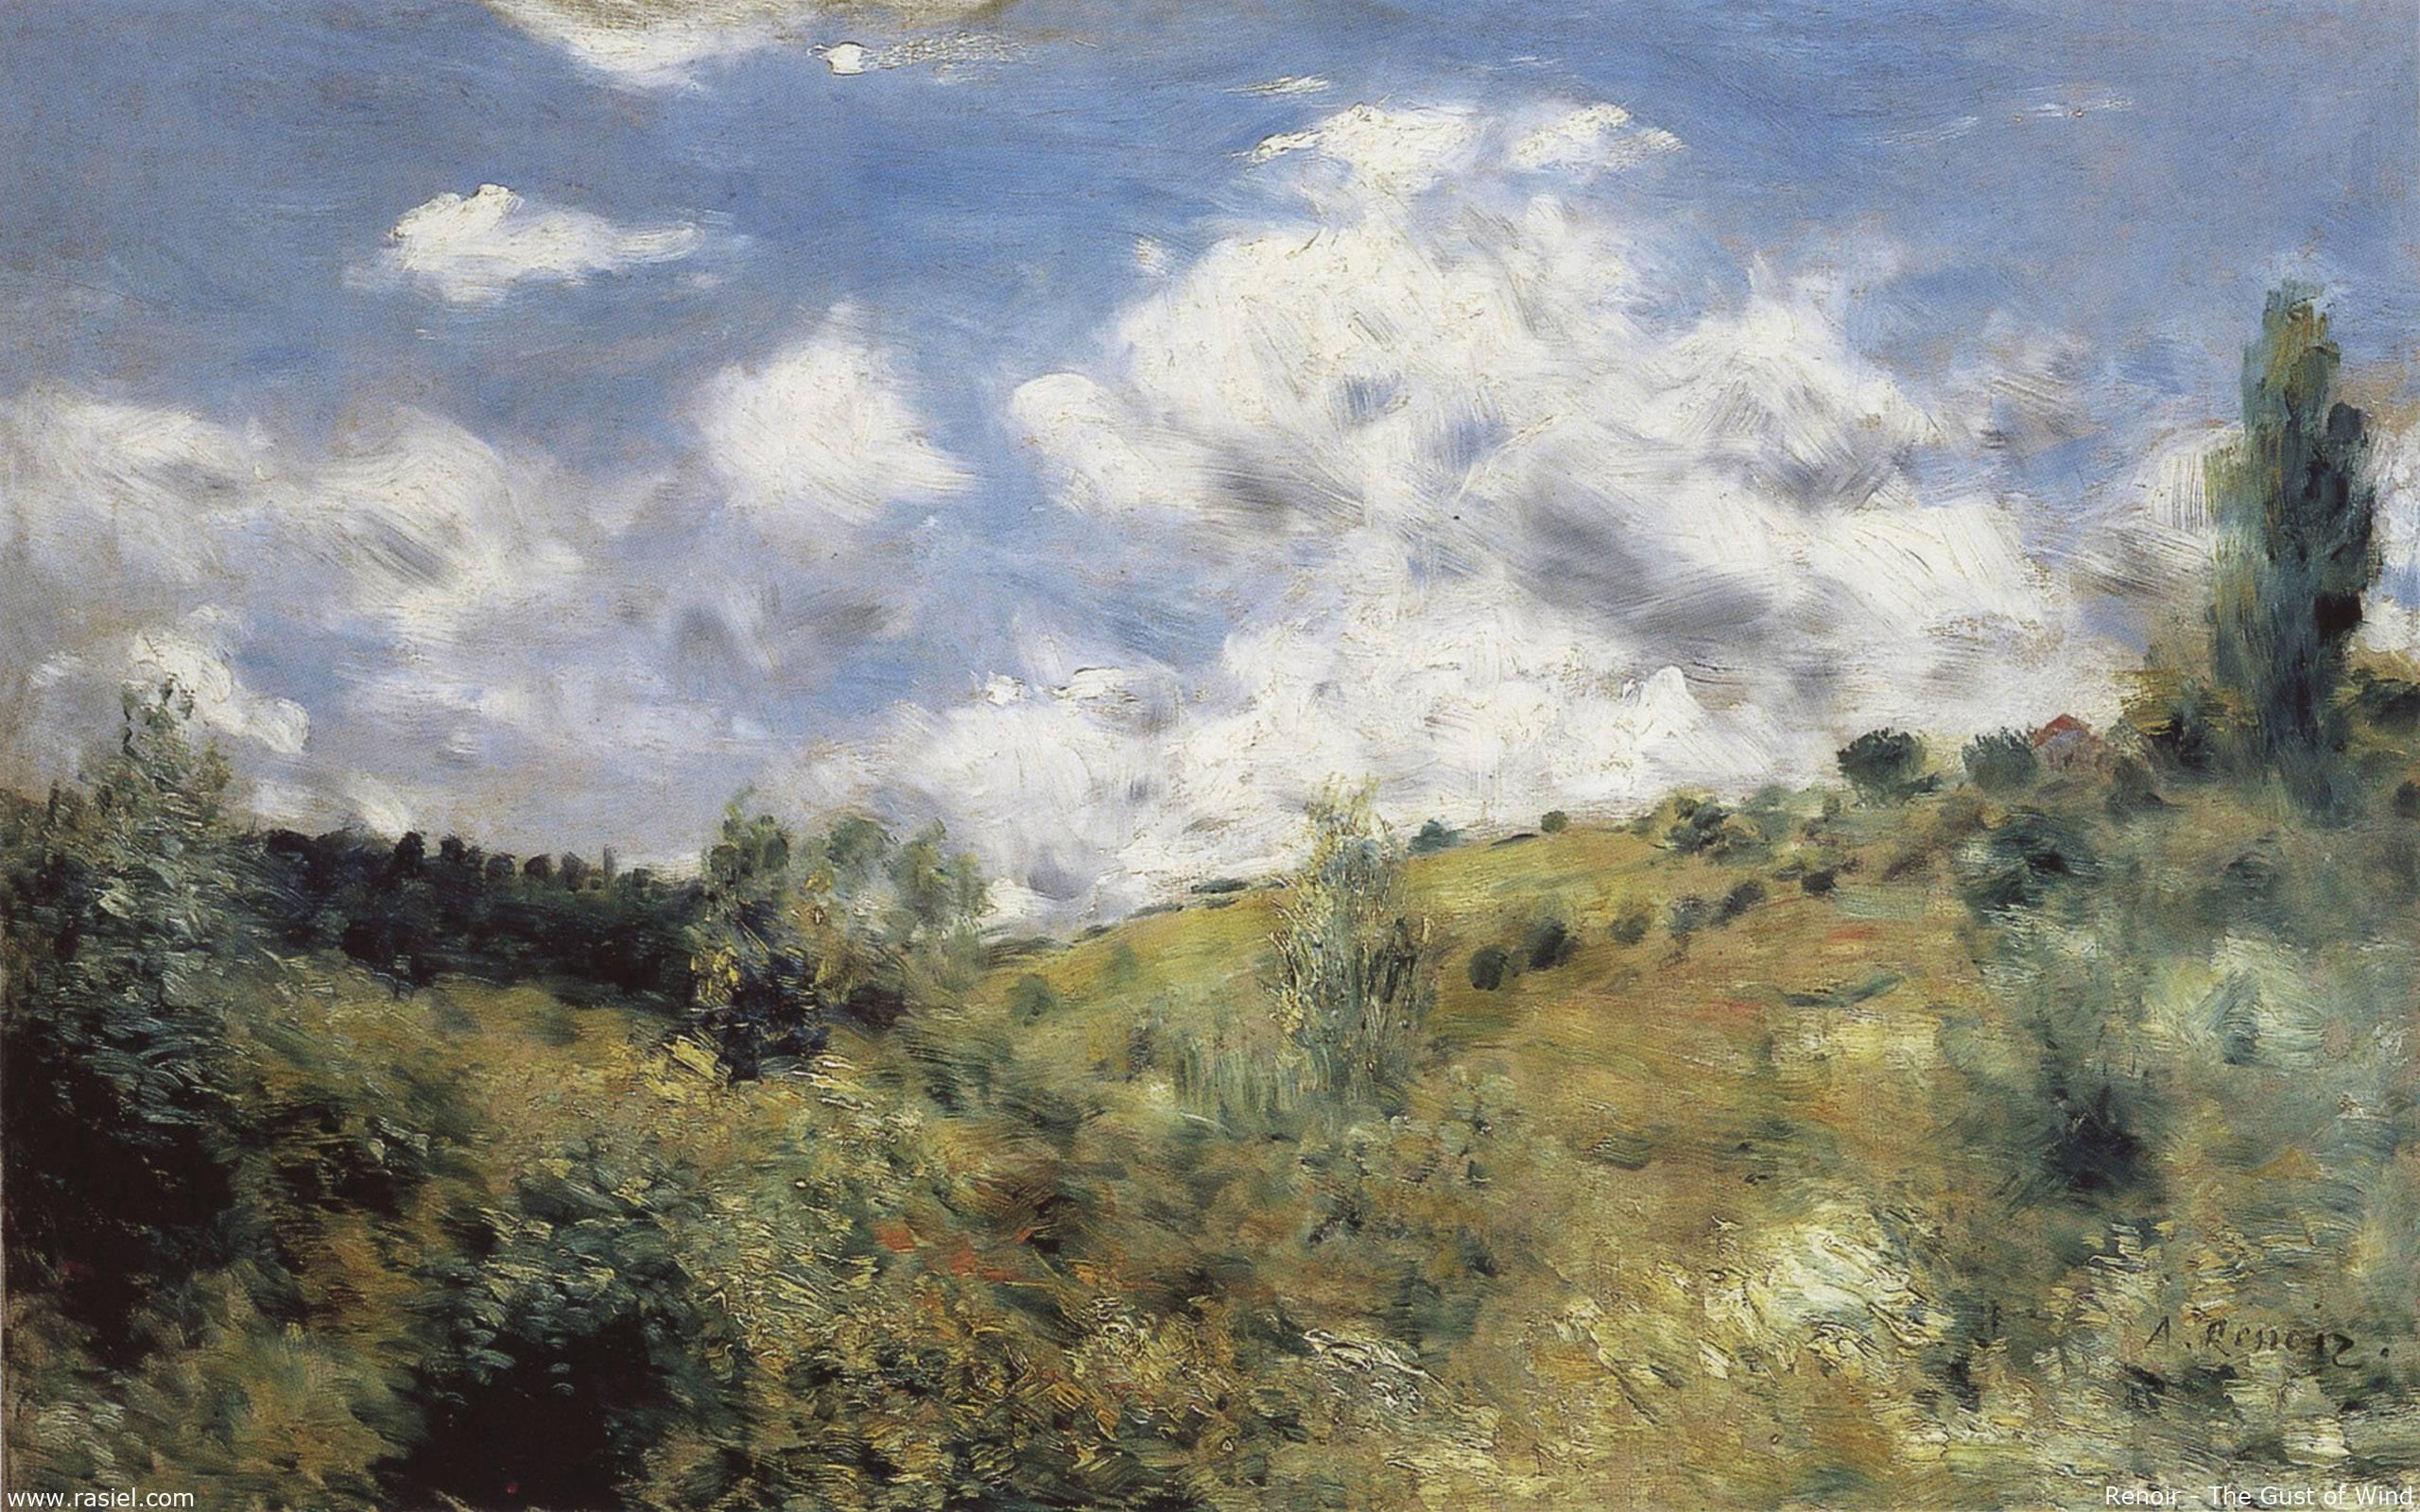 2560x1600 Renoir hình nền